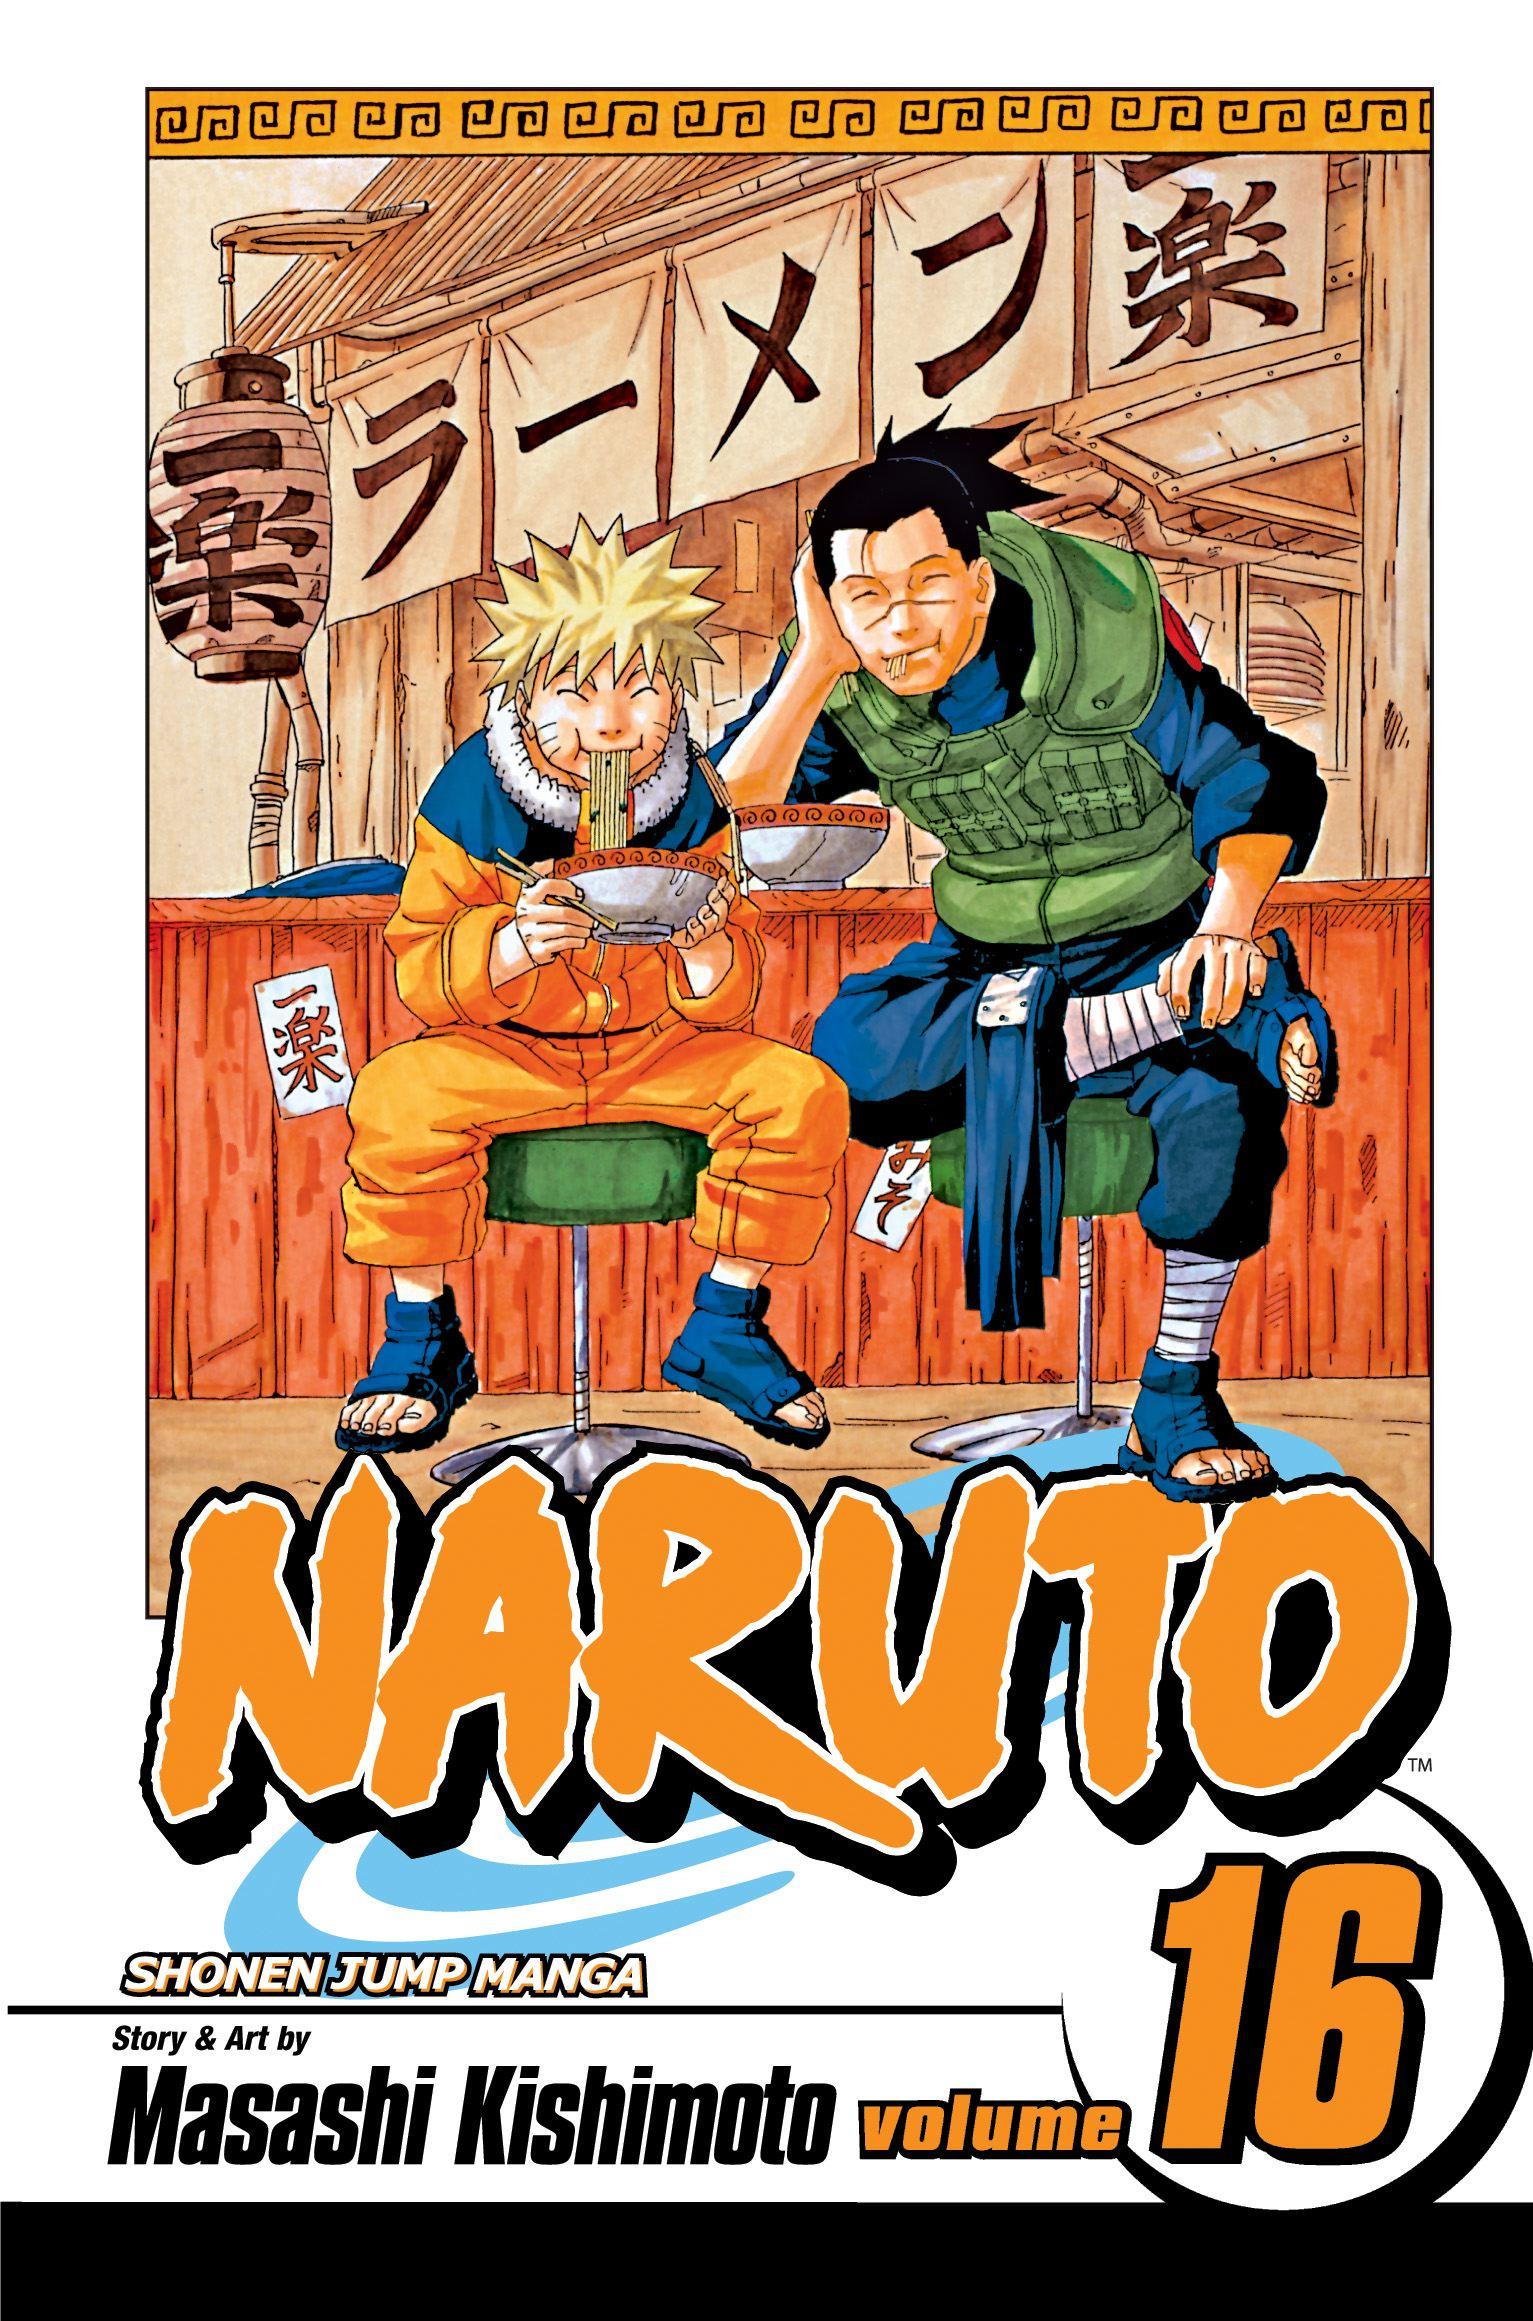 Naruto vol 16 9781421510903 hr